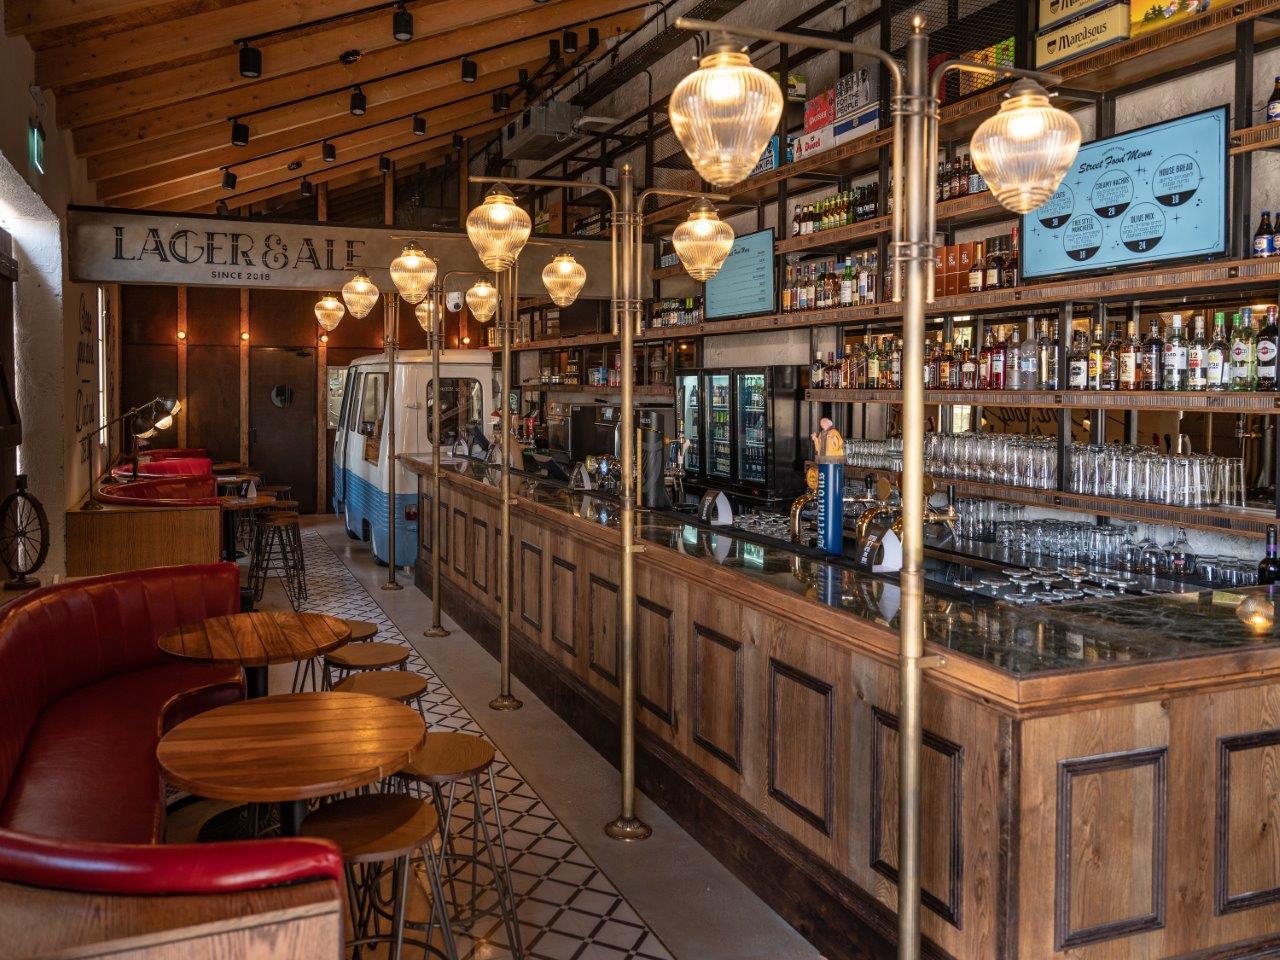 lager&ale -  צילום: אנטולי מיכאלו